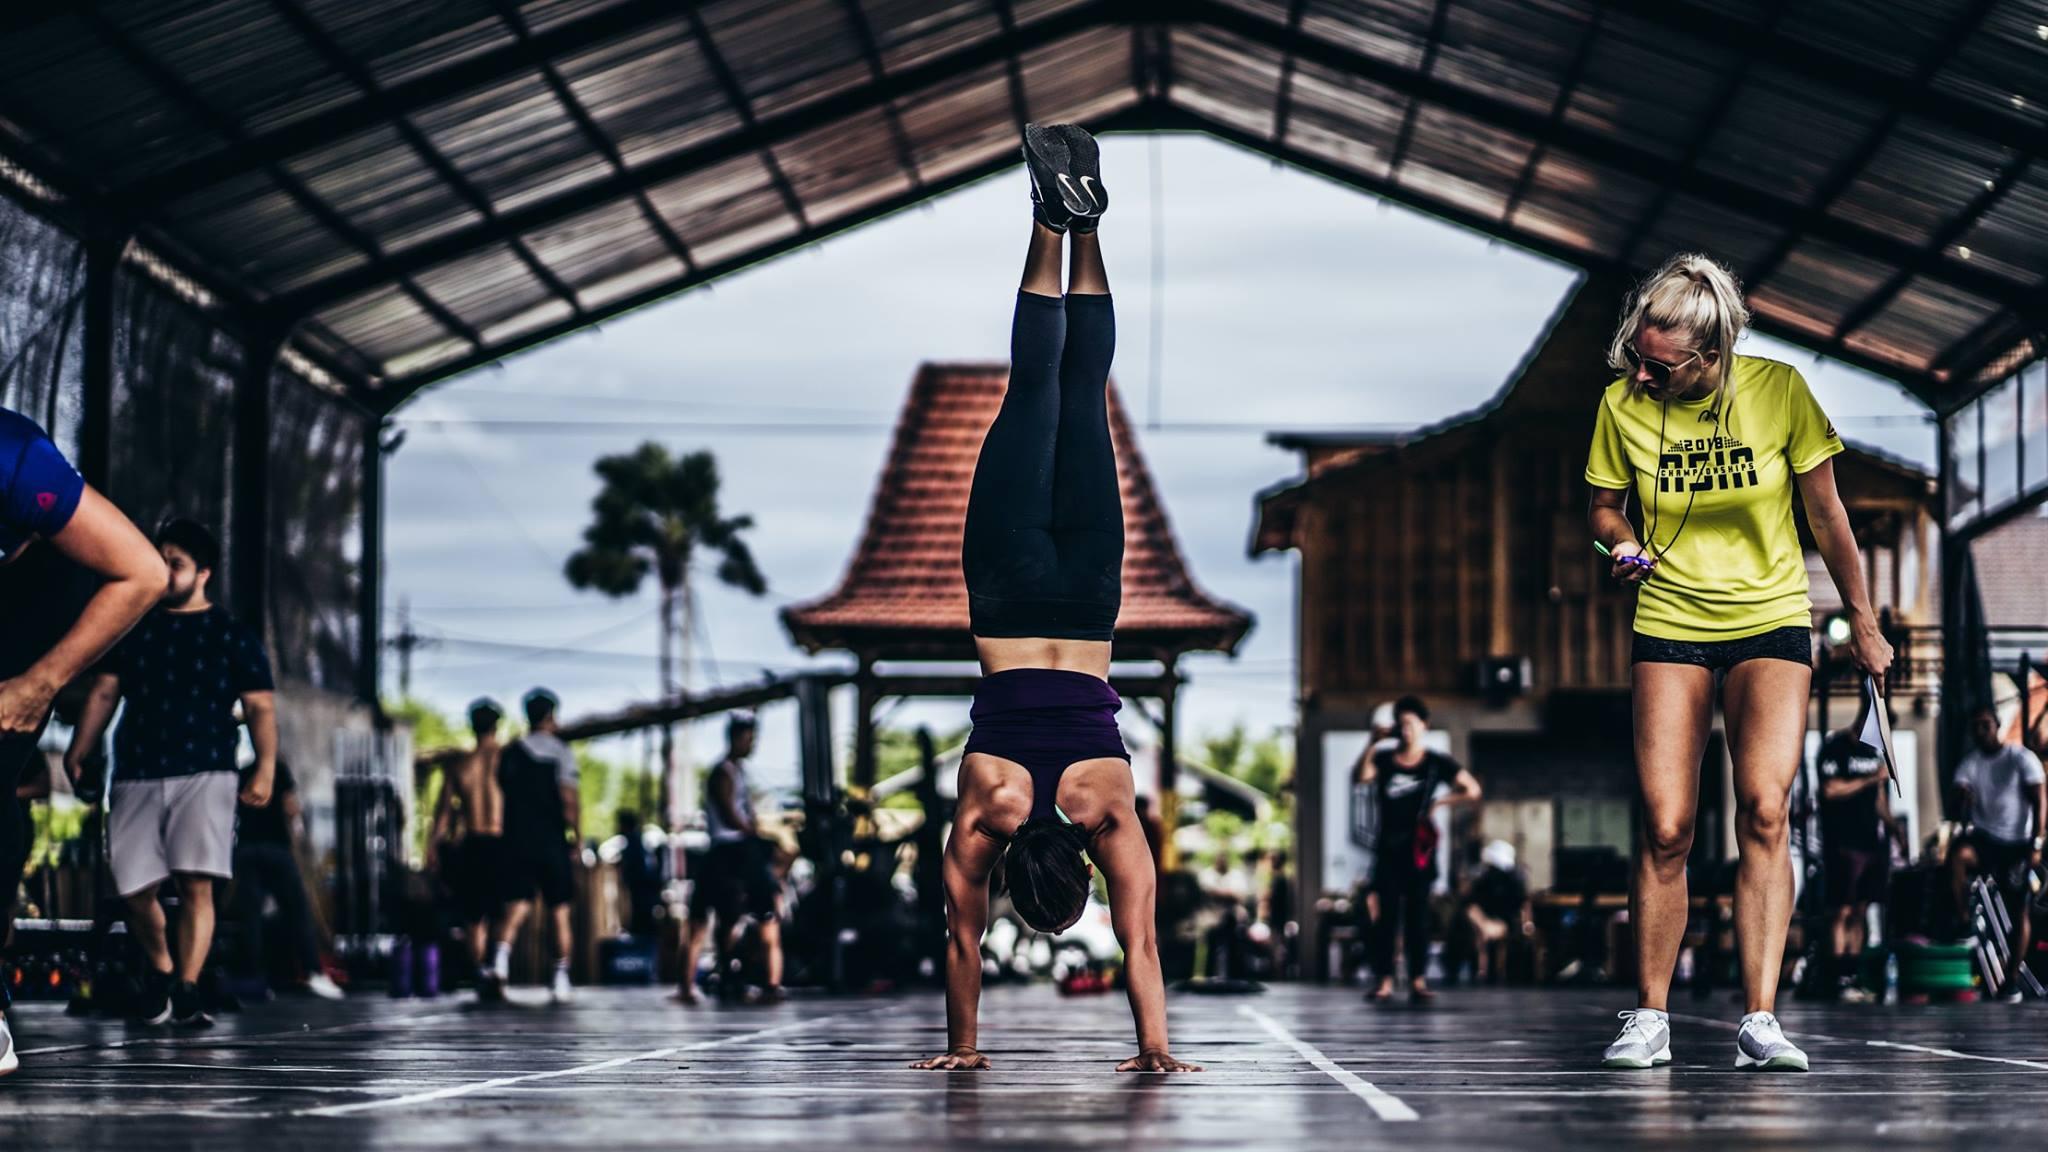 CrossFit 20.3 Open Workout: Deadlifts, handstand push-ups and handstand walk